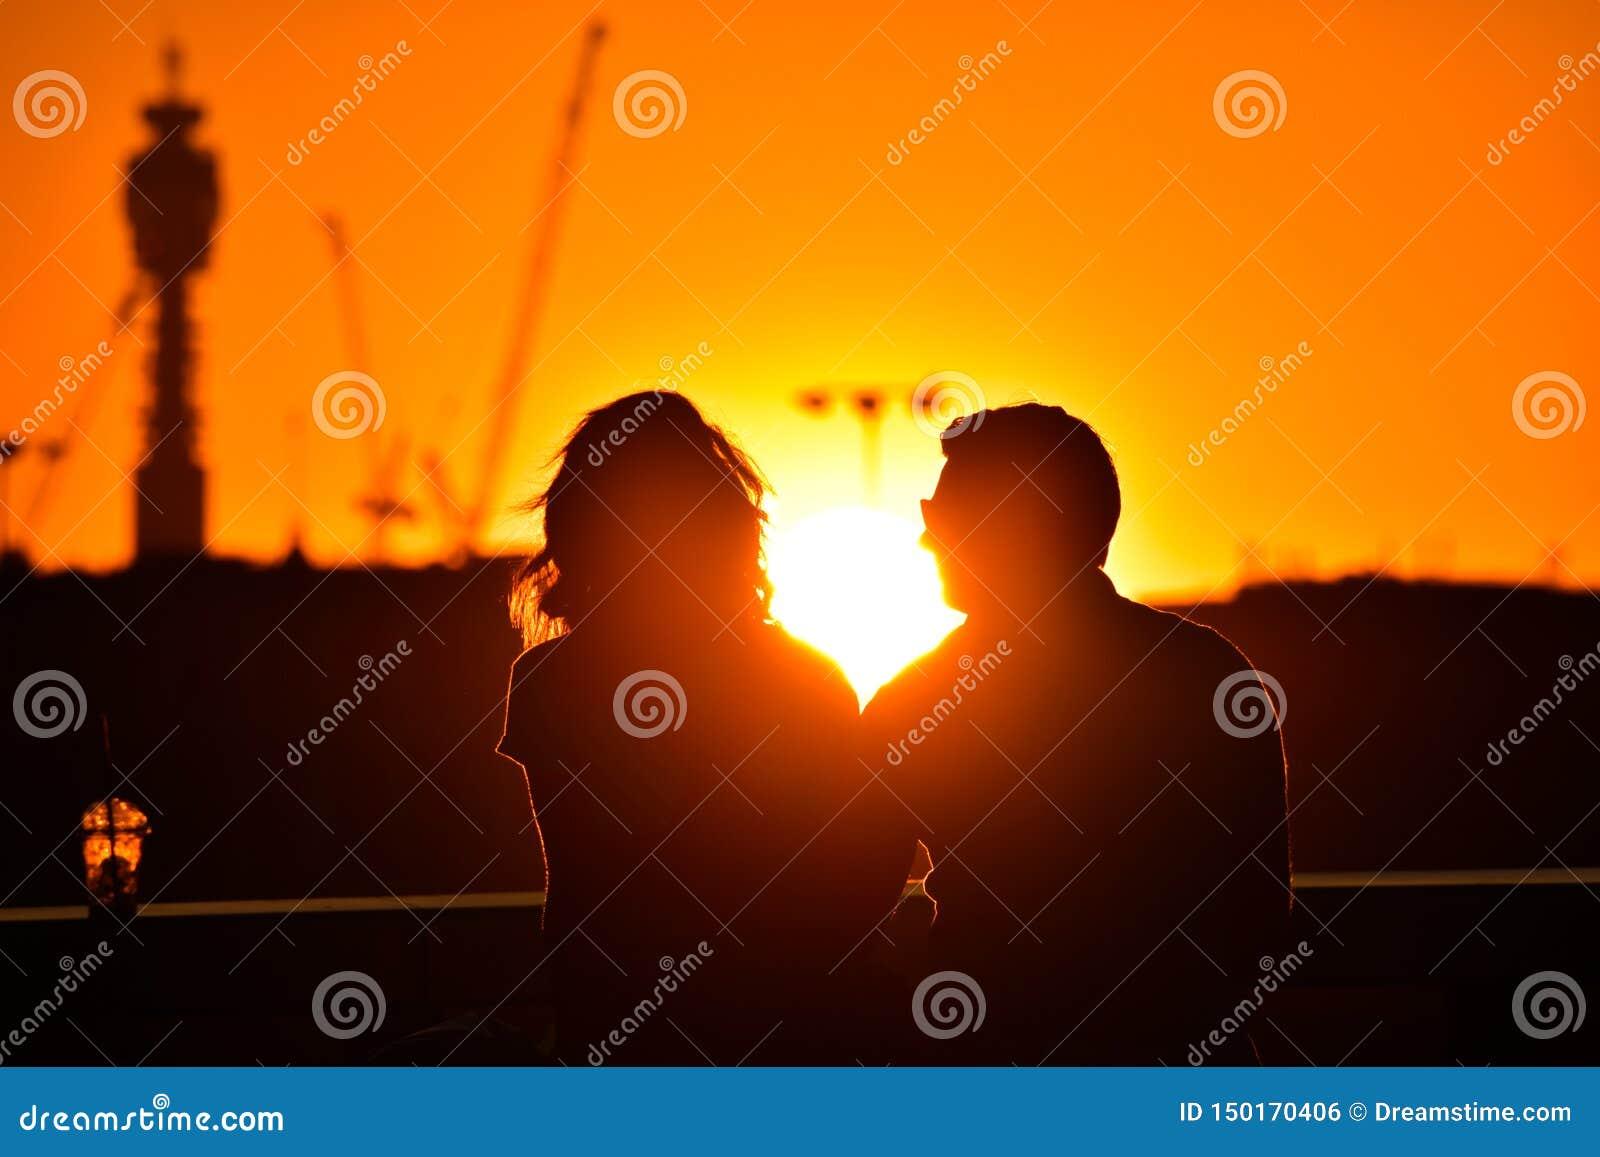 Силуэт любя пар наблюдая красивый яркий романтичный заход солнца